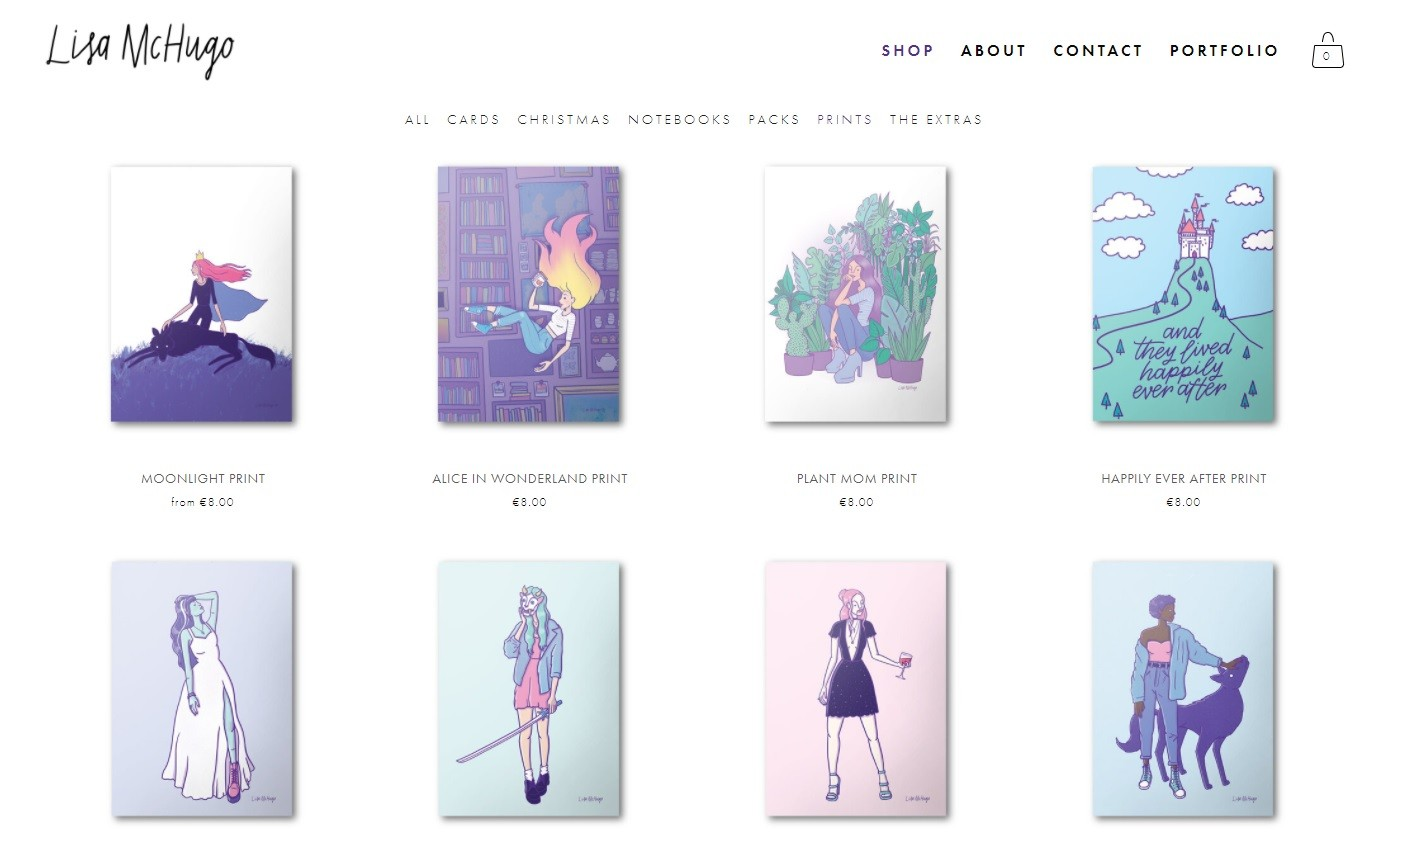 Lisa McHugo Online Shop irish illustrators and irish artists